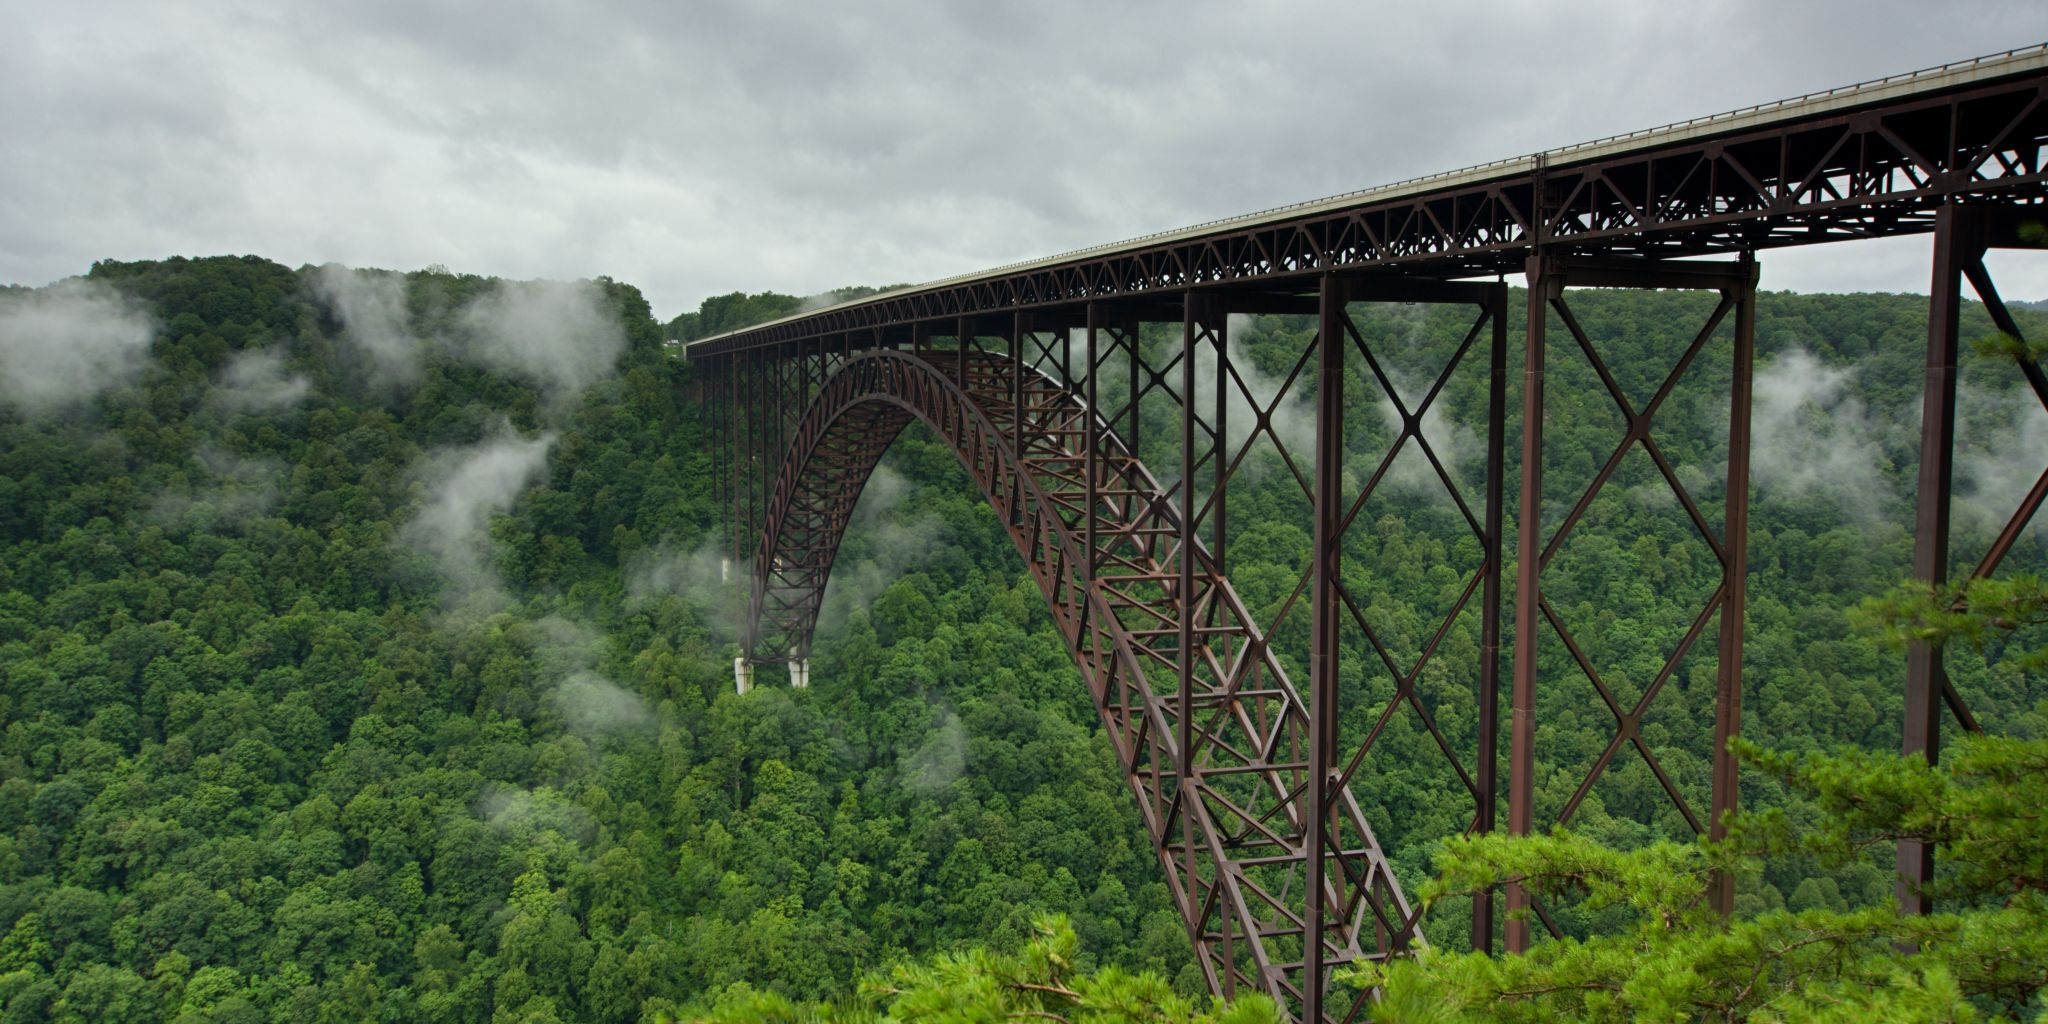 New River Gorge Bridge, USA